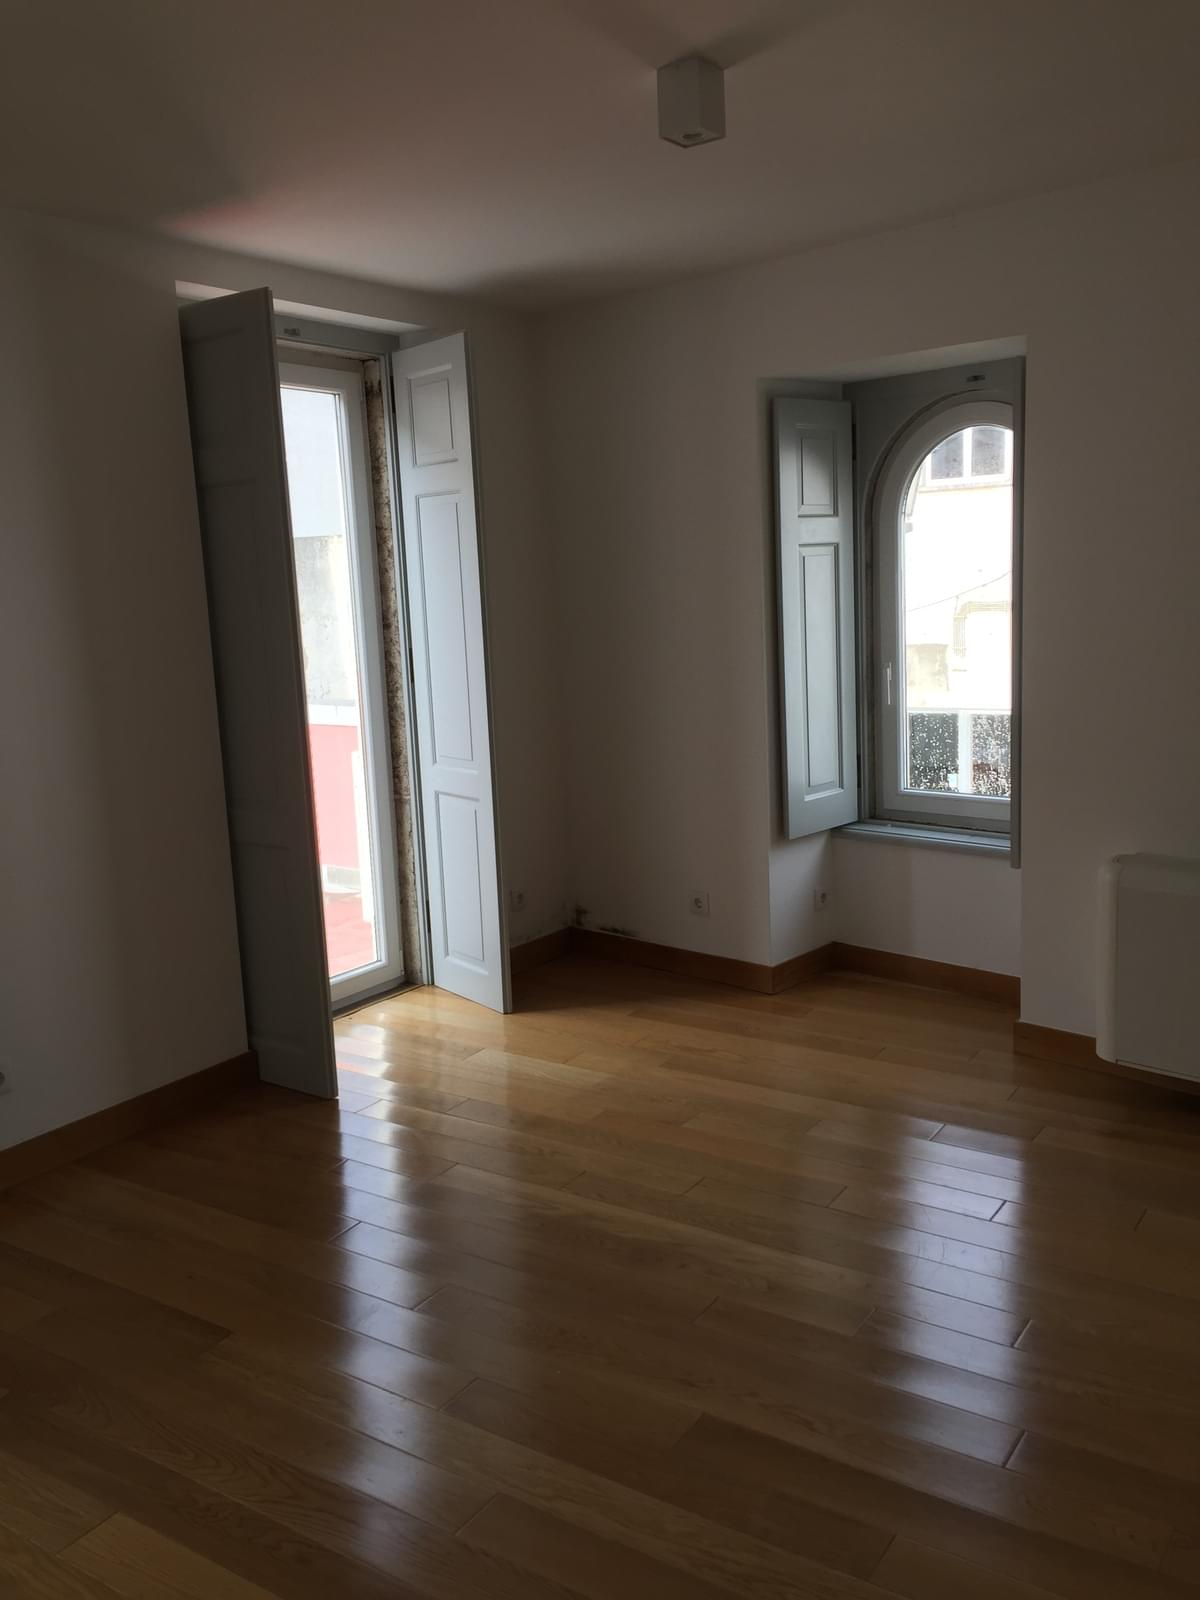 pf19228-apartamento-t1-cascais-5c4ba8c8-f1ca-465a-b62b-914a8d247e03